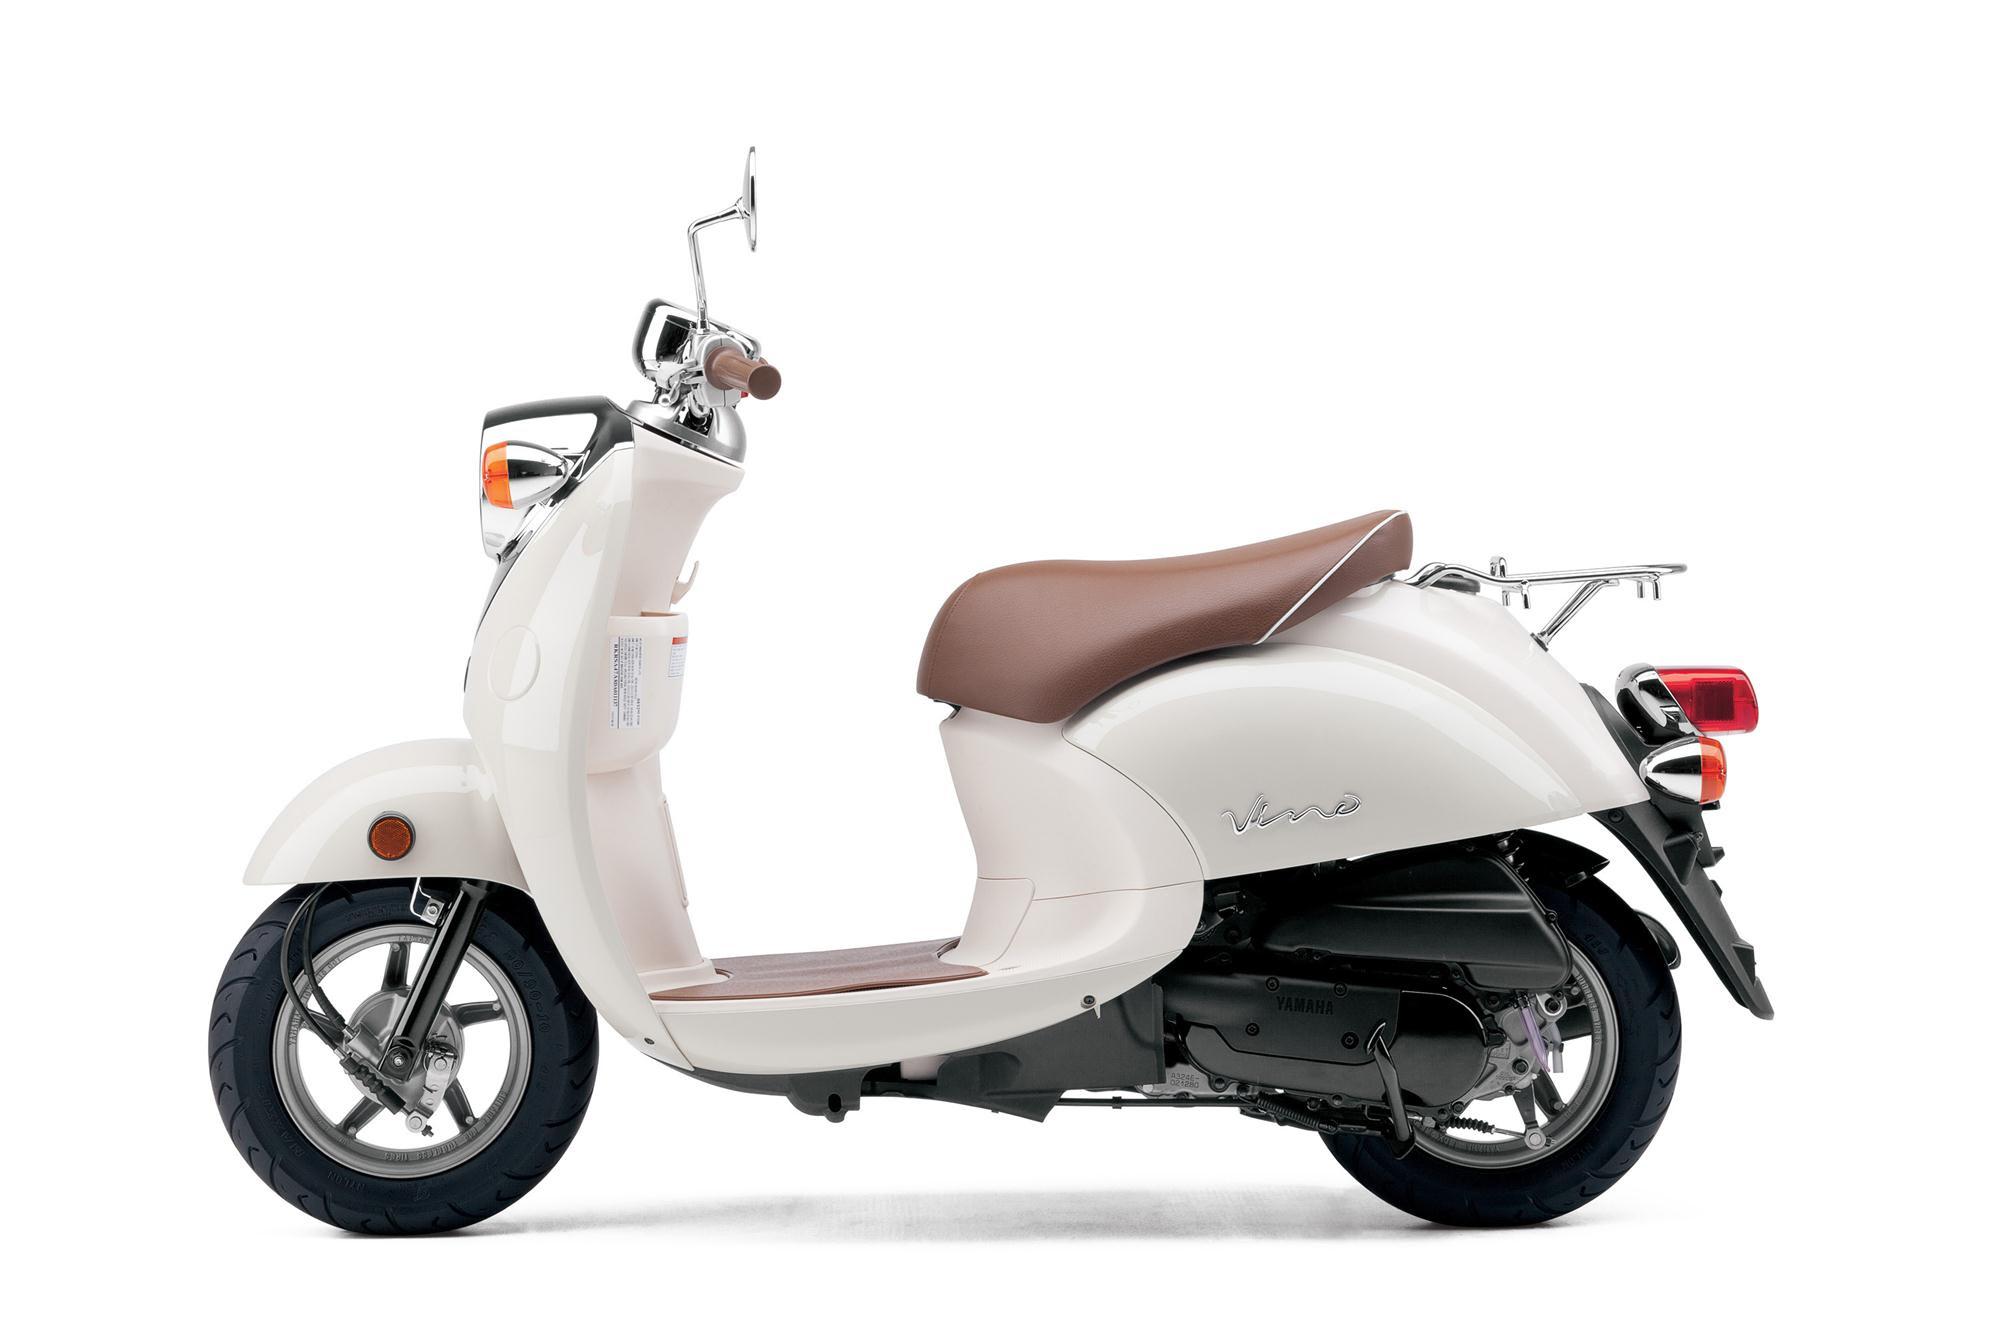 2013 Yamaha Vino Classic  Evokes Vespa Styling autoevolution